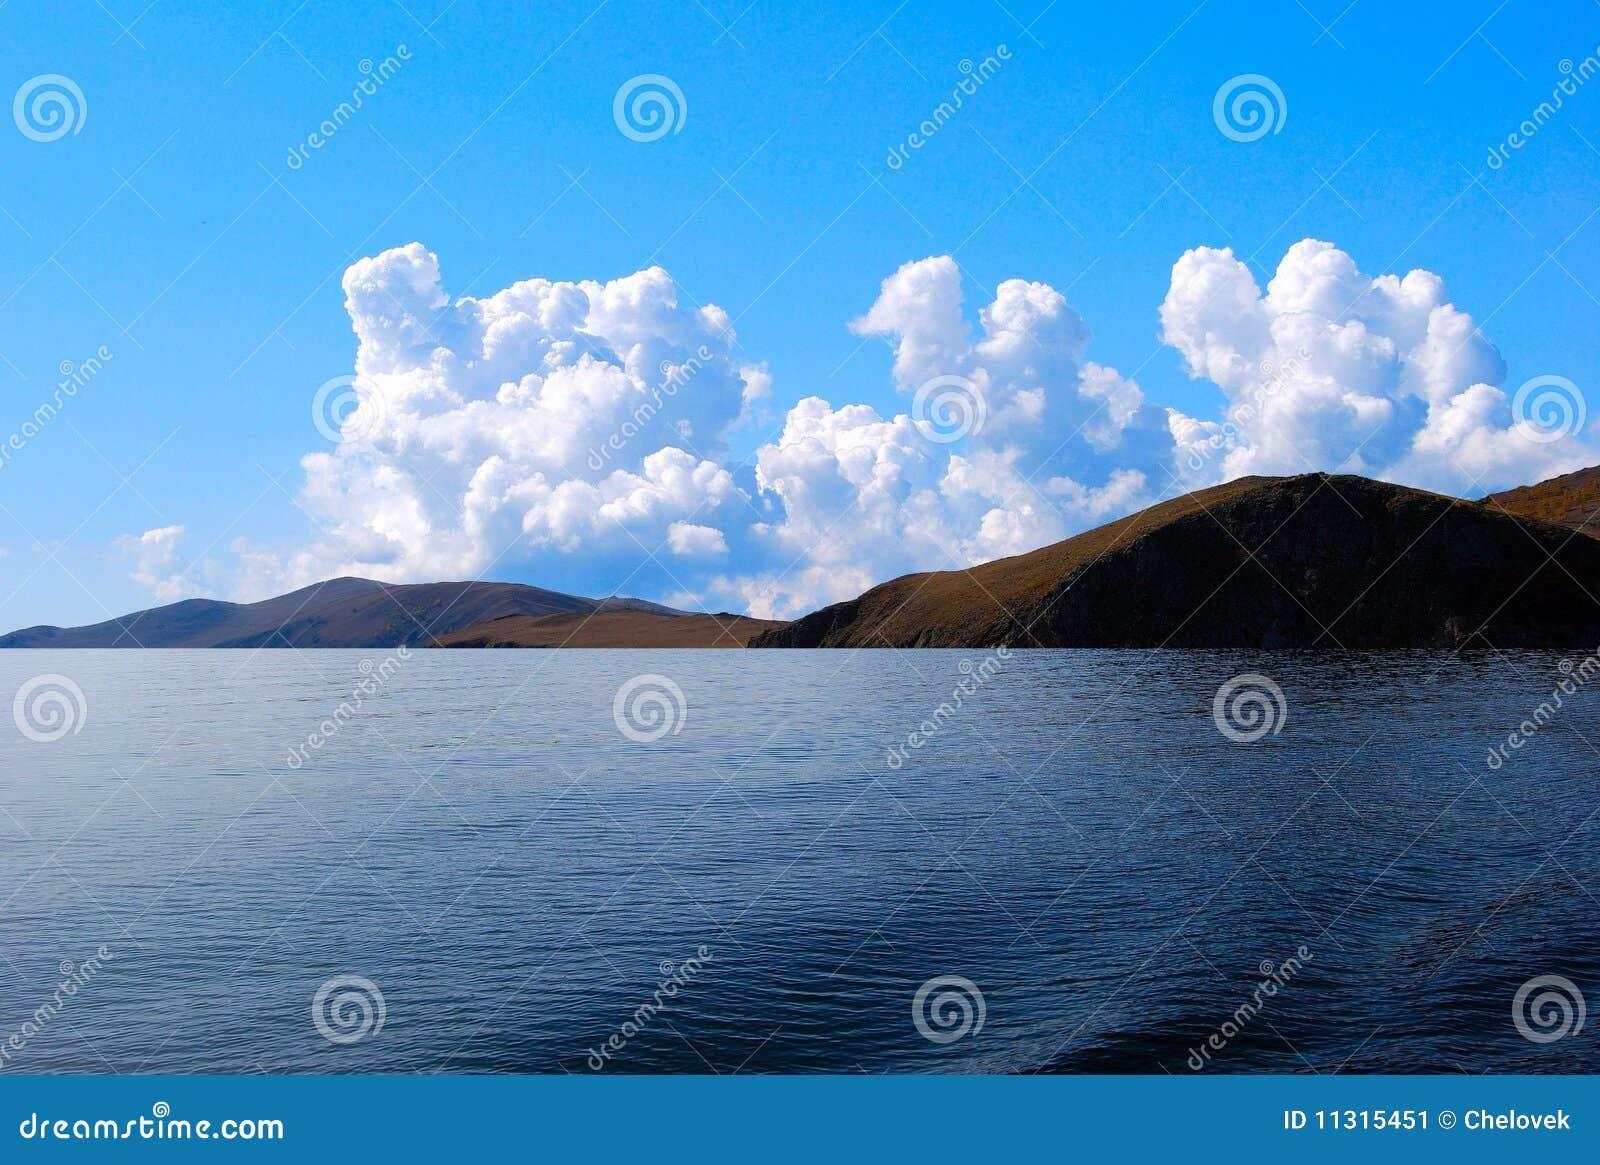 See Baikal